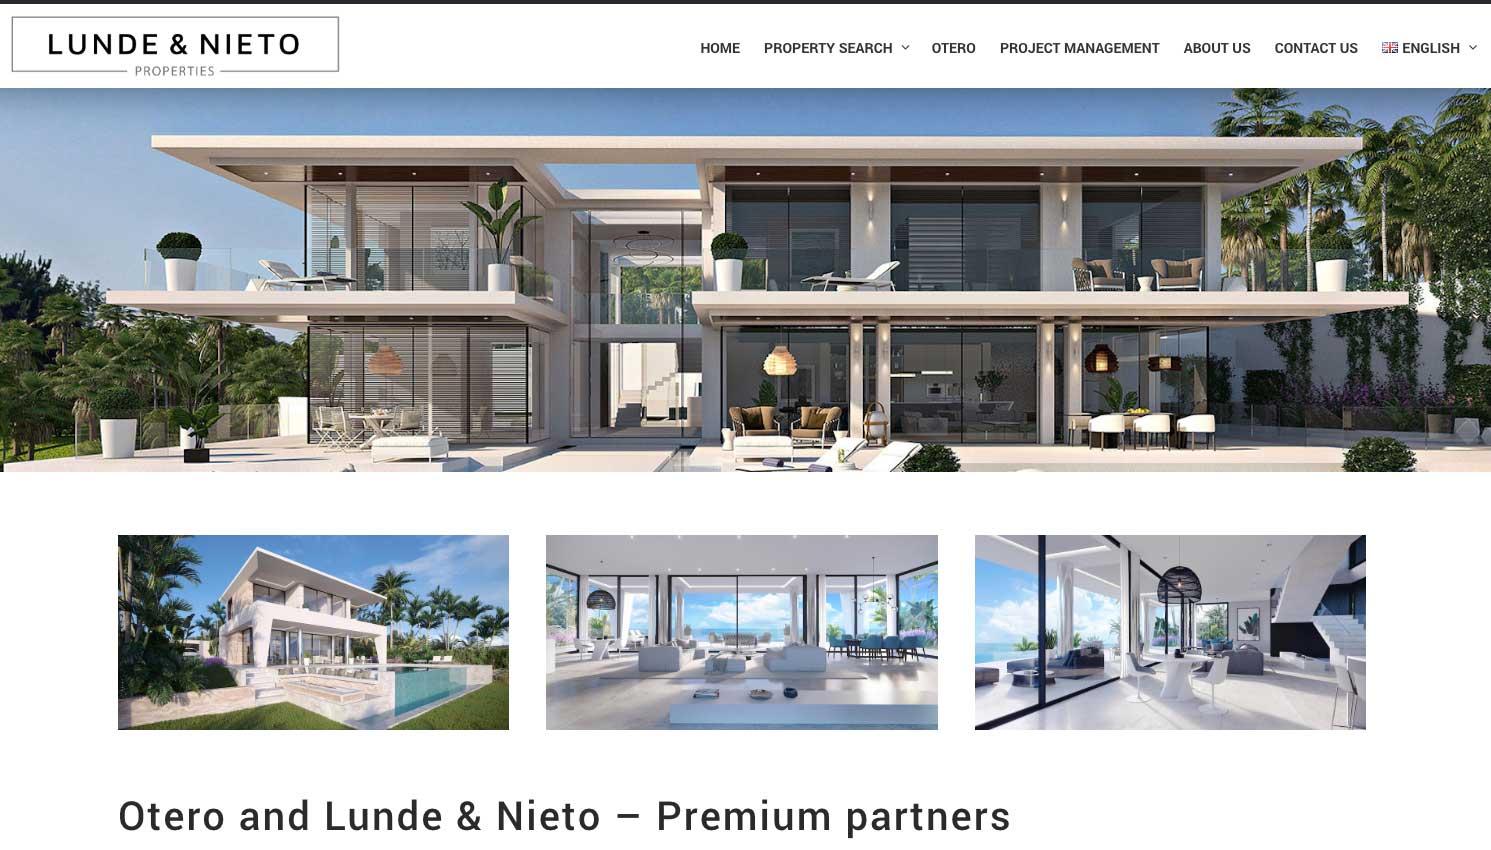 lunde nieto real estate agency and Property Advisors marbella costa del sol